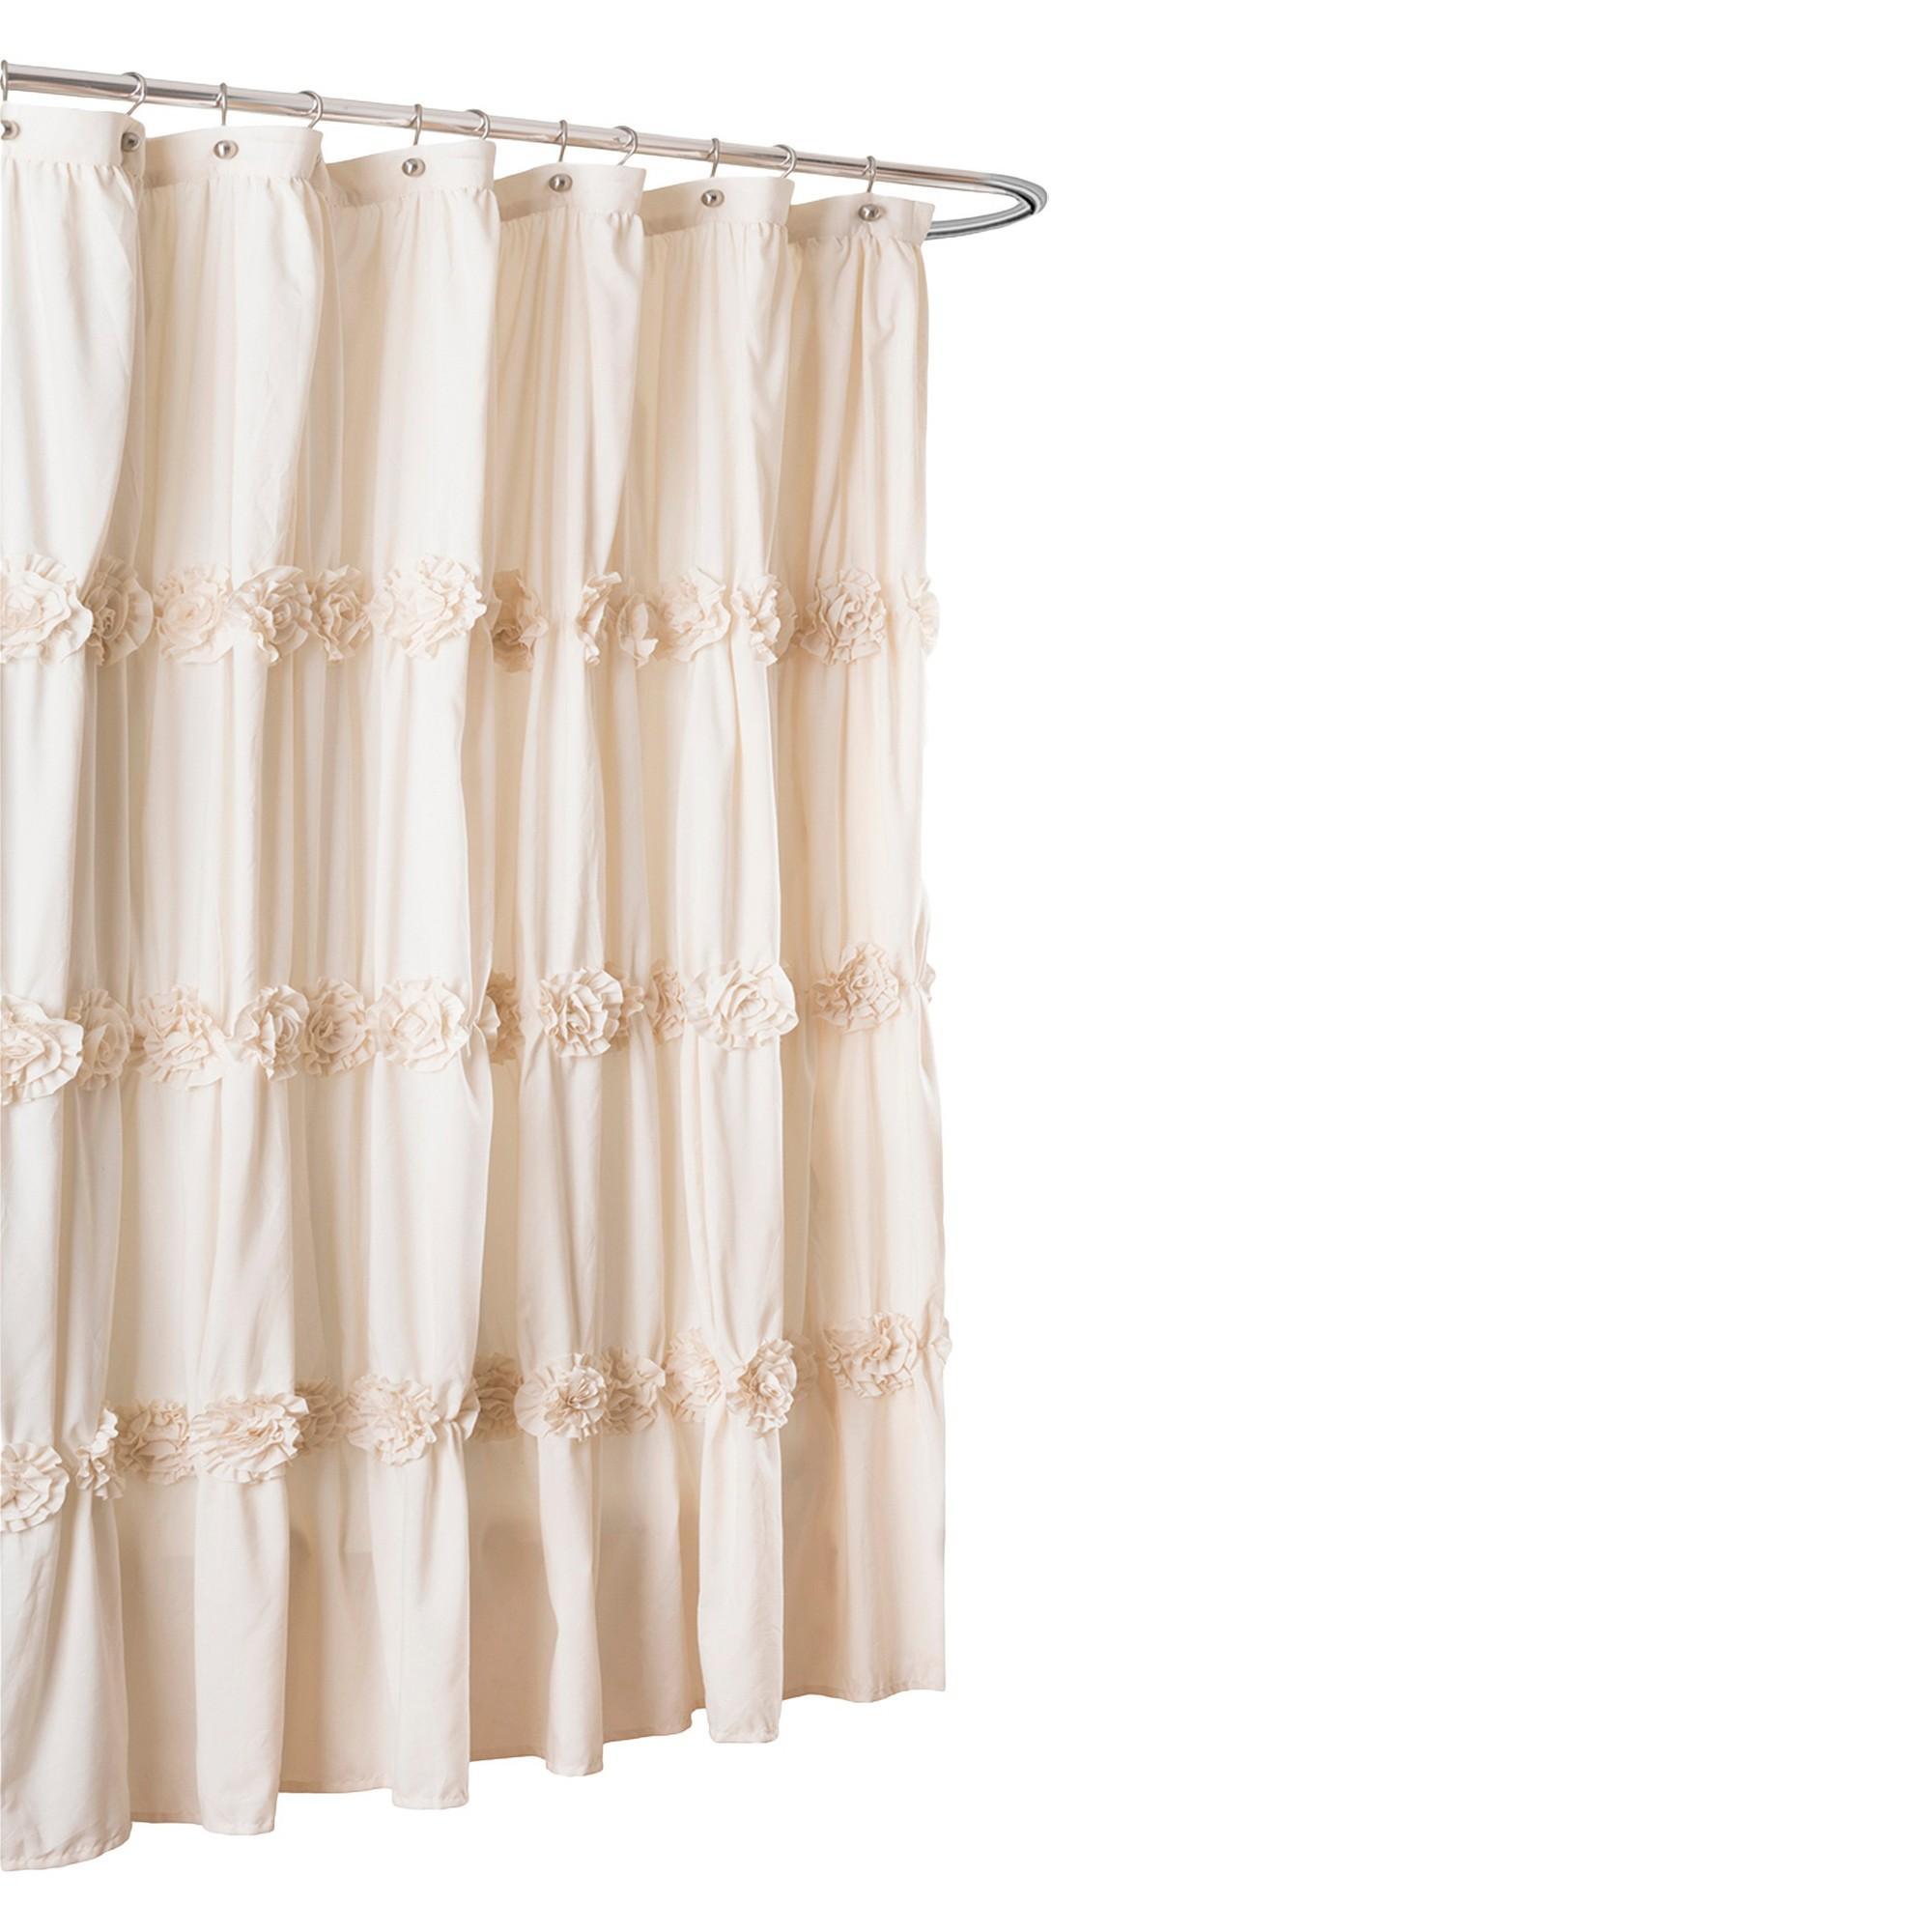 Darla Horiz Texture Shower Curtain Off White Lush Decor Shabby